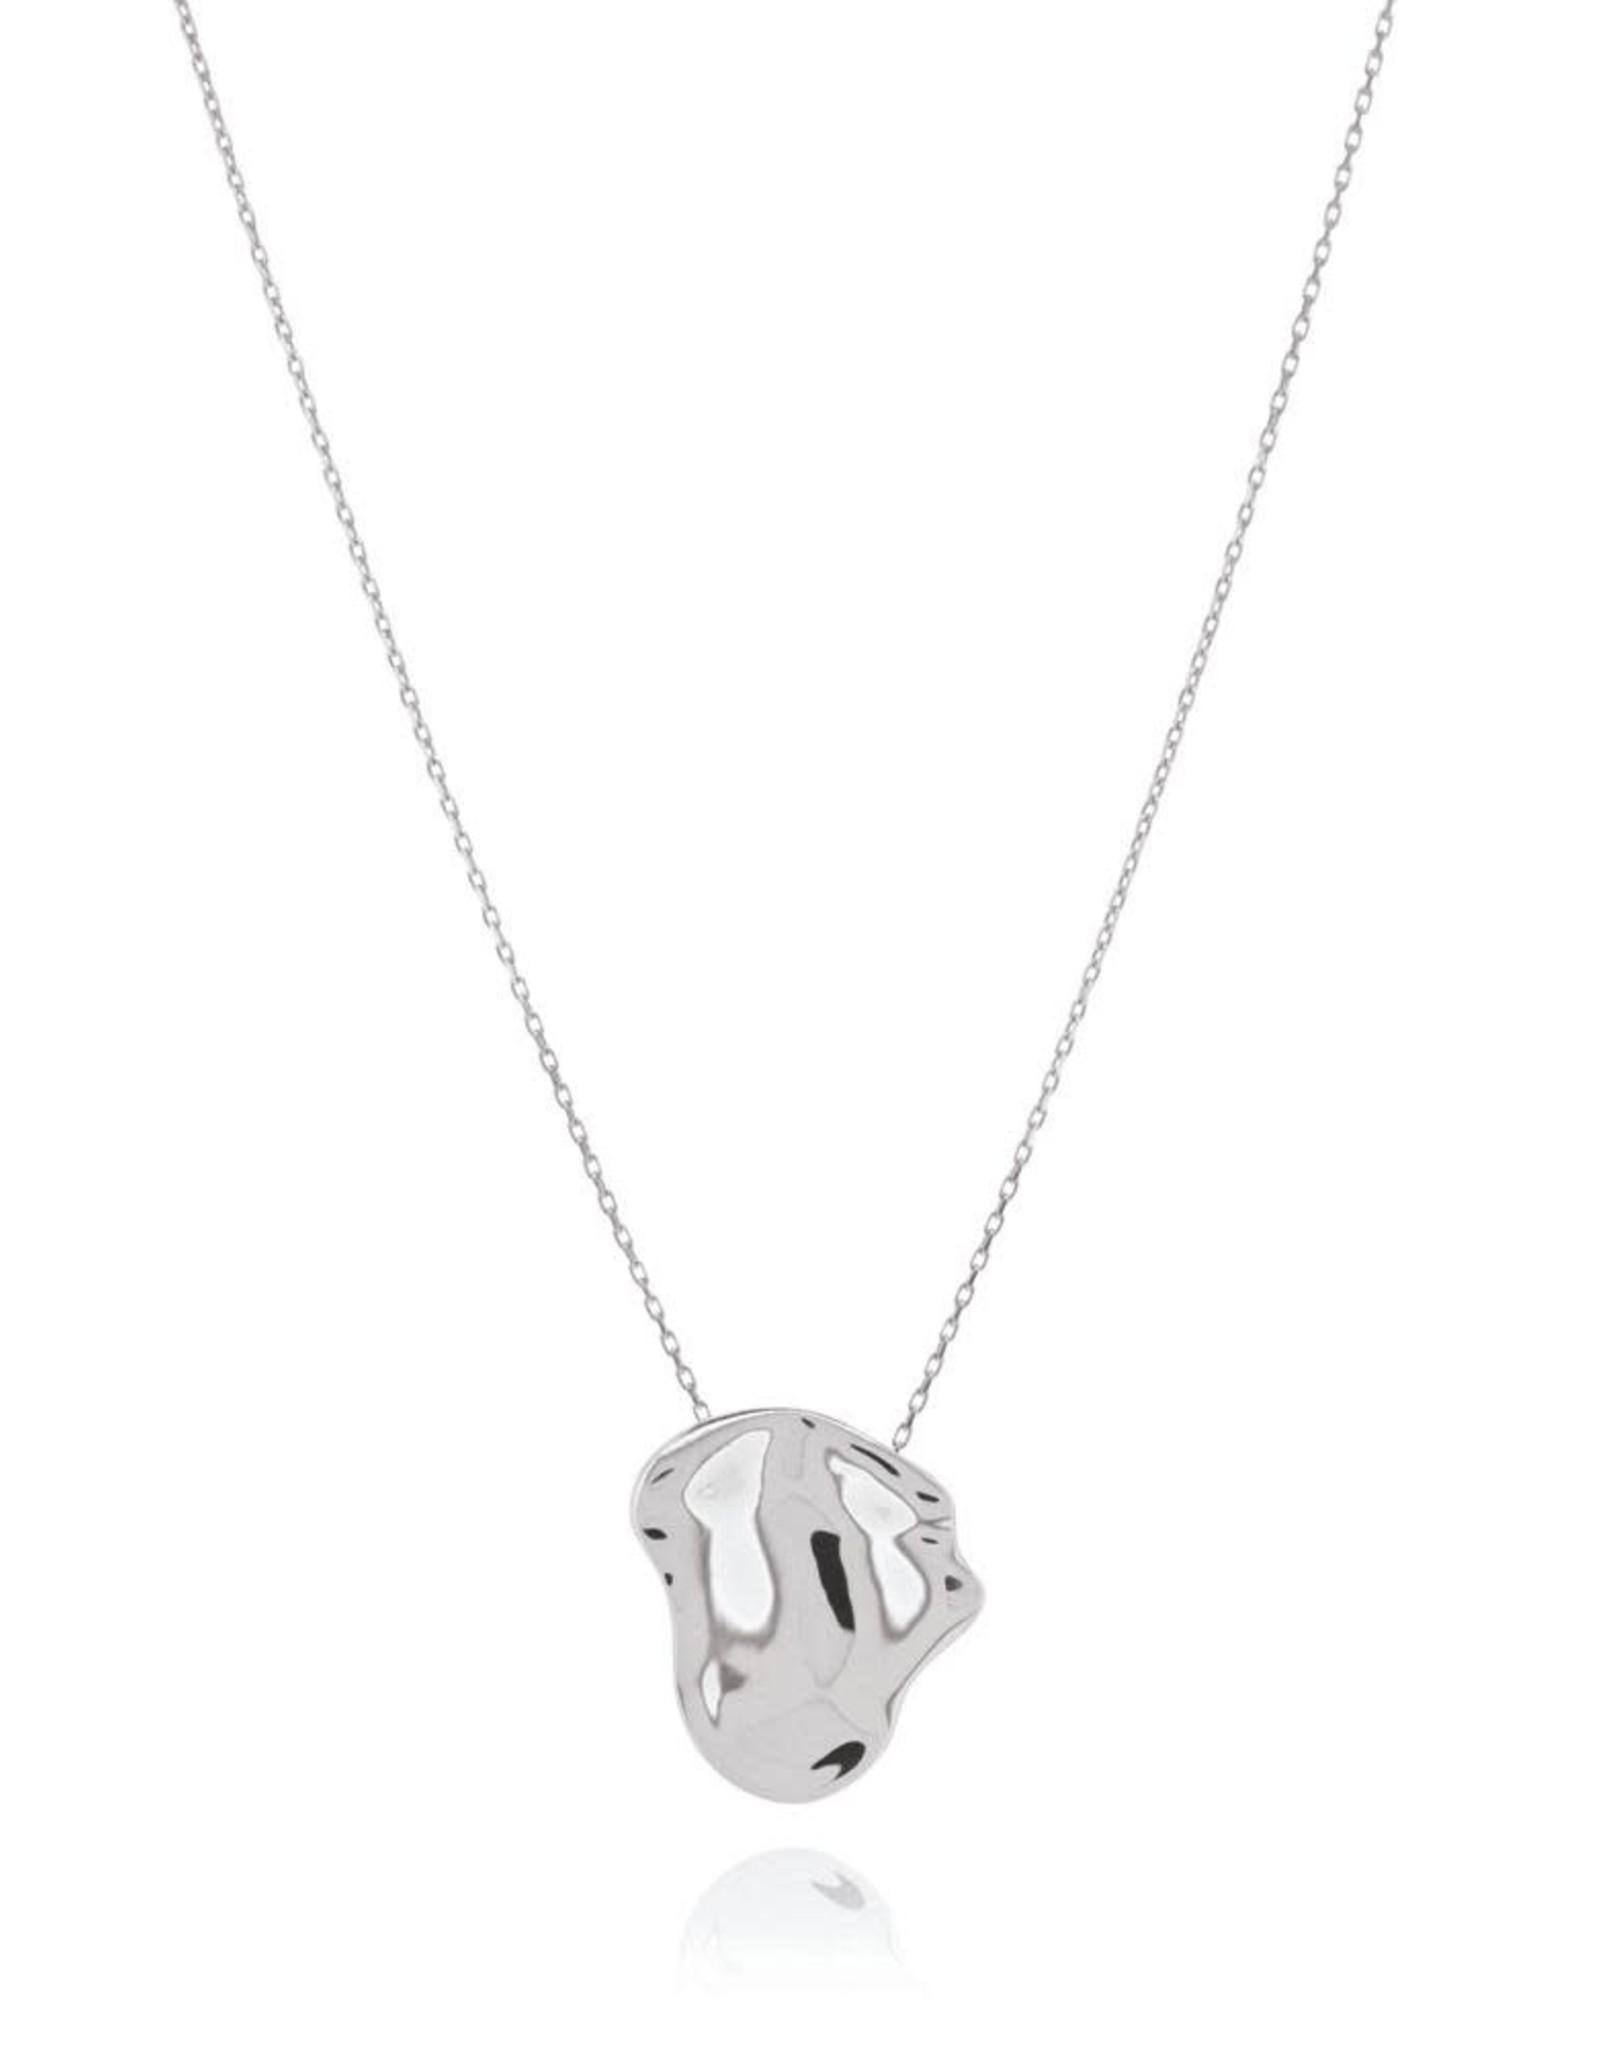 Morph Necklace, Silver